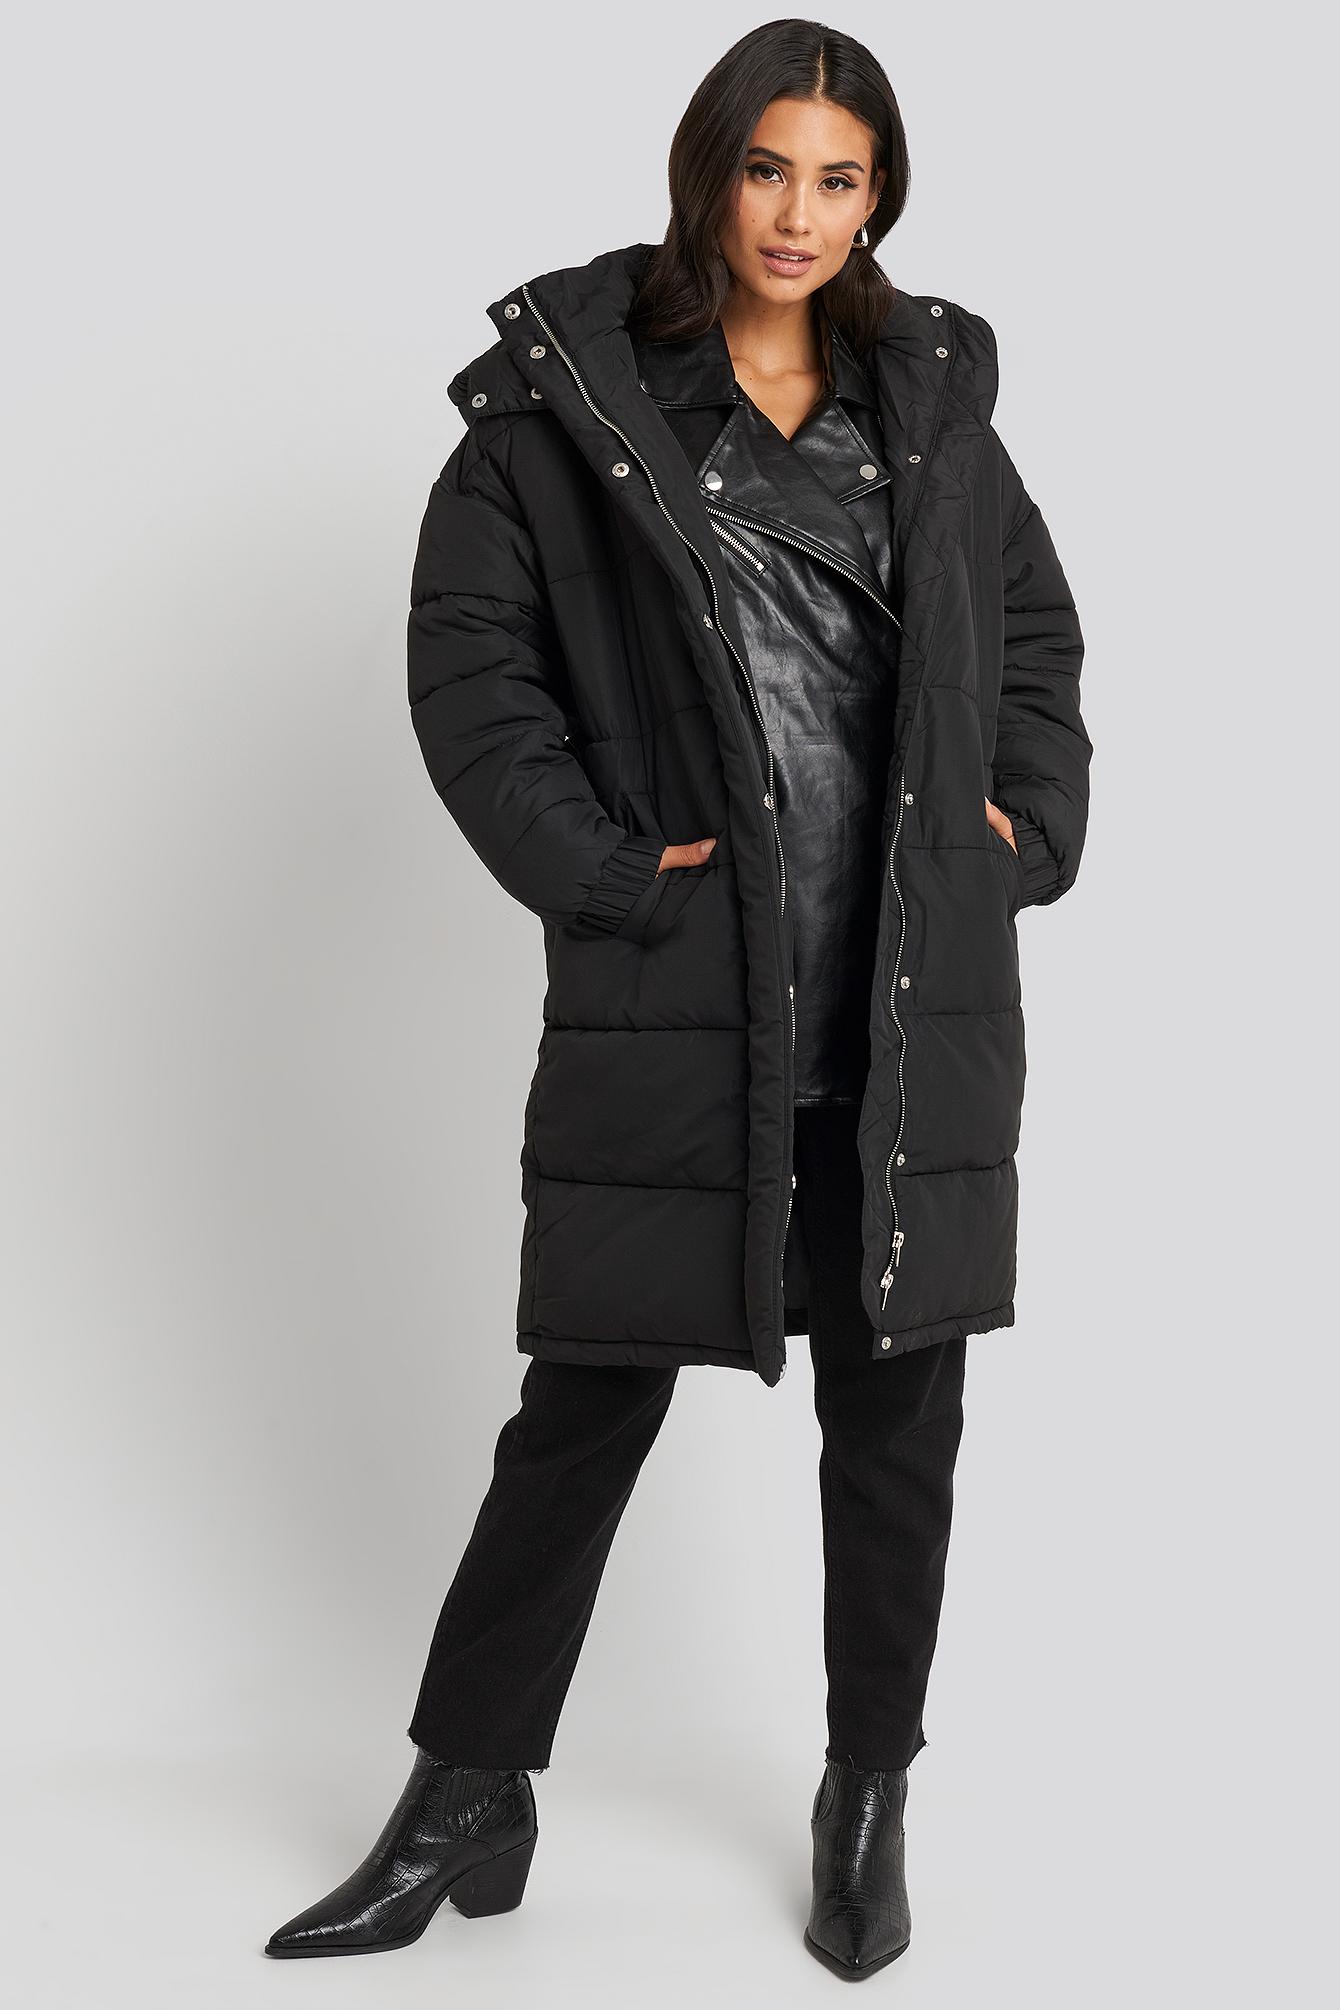 sparkz -  Amelia Long Coat - Black